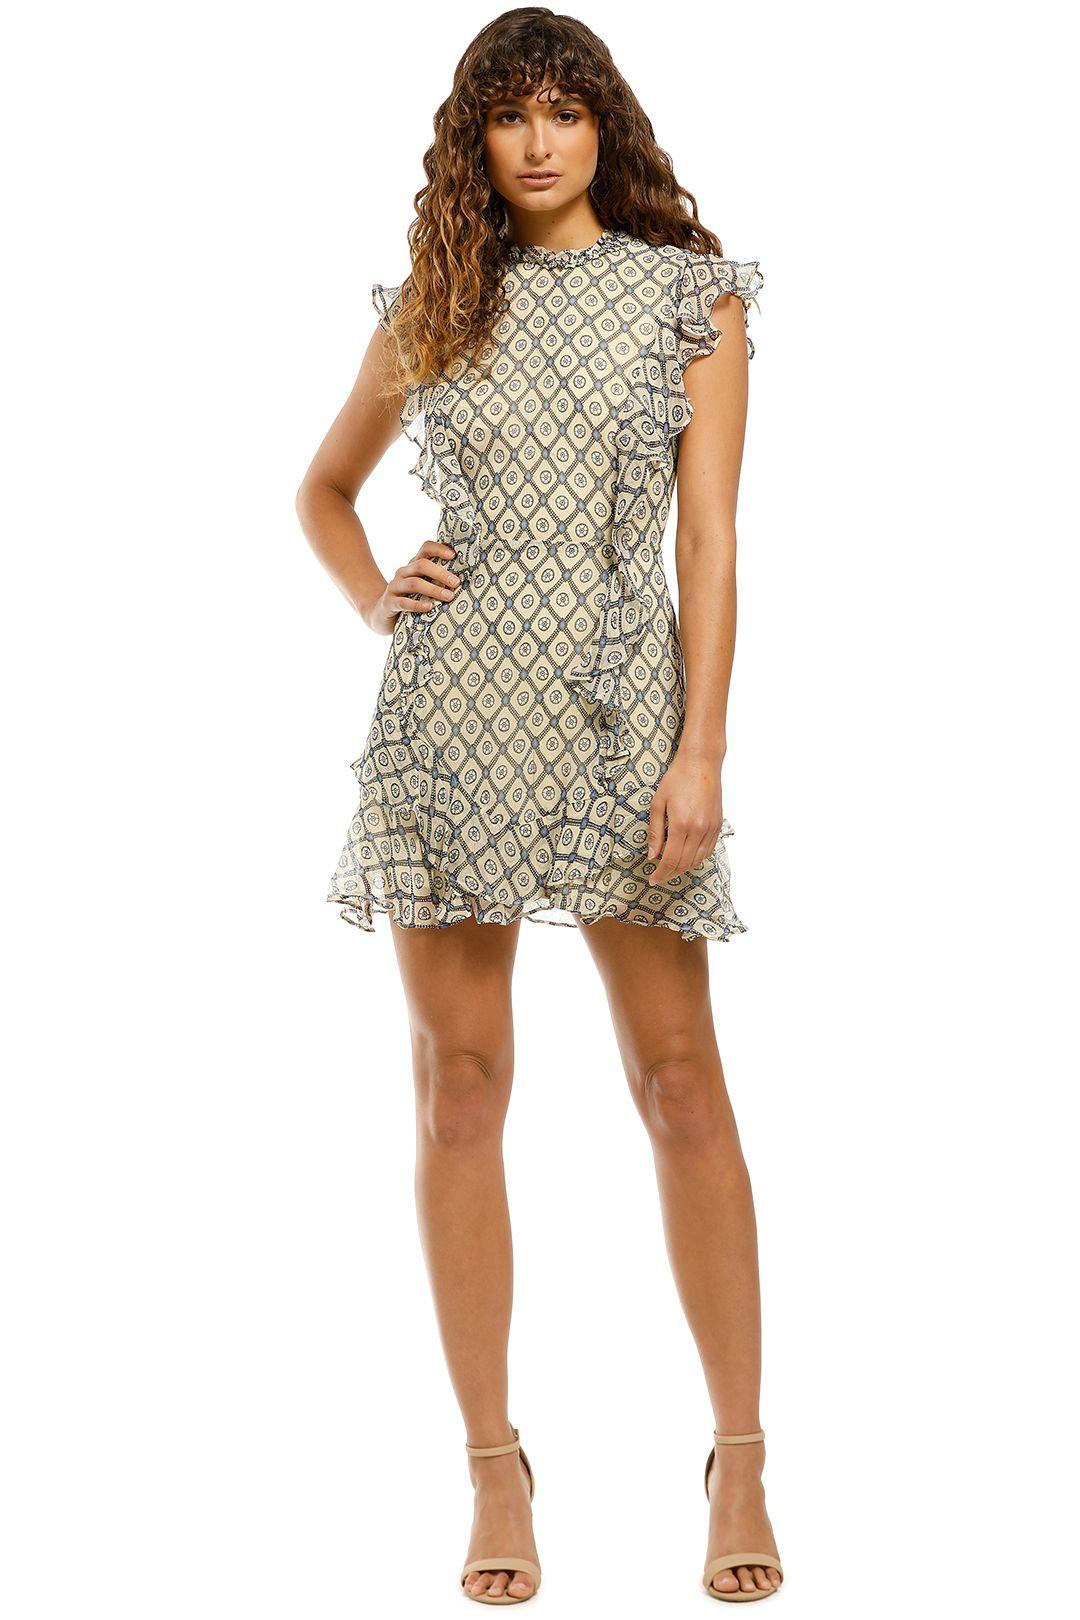 Stevie-May-Beaming-LS-Mini-Dress-Sienna-Print-Front